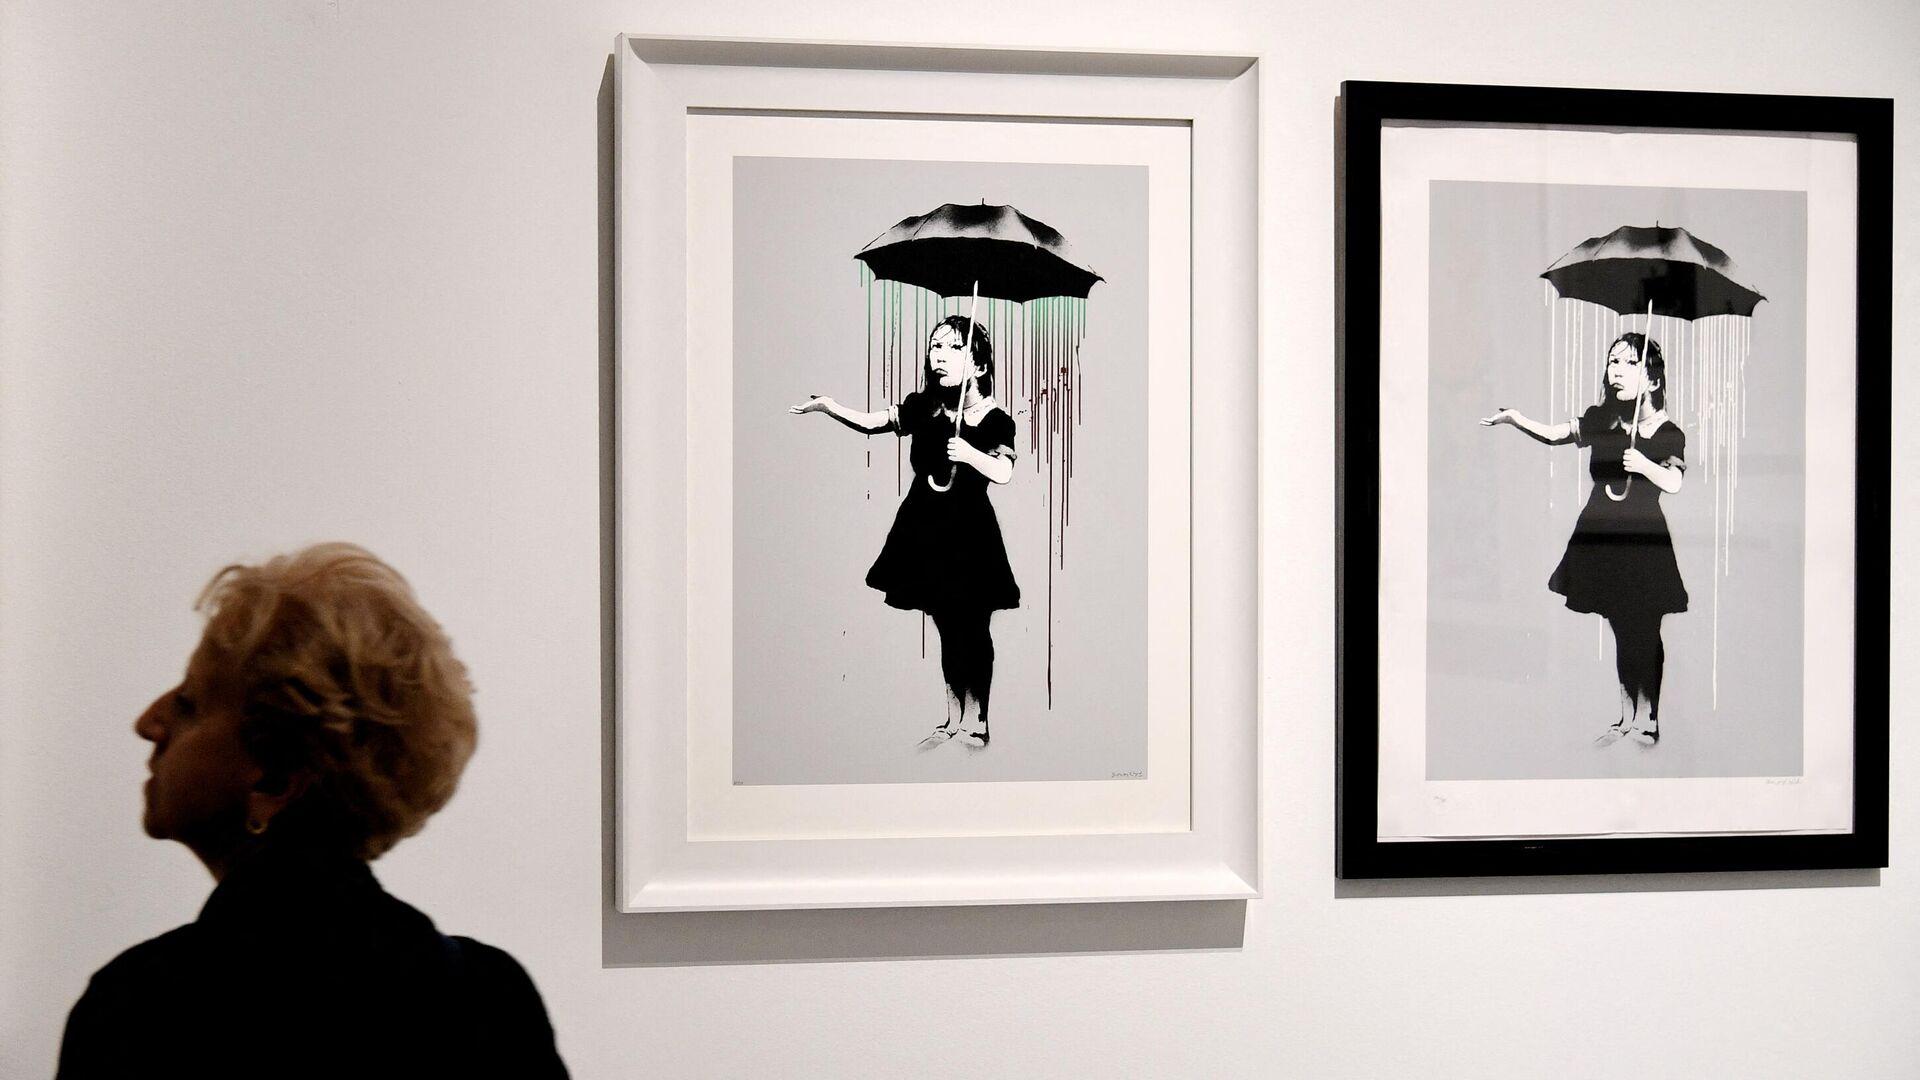 La obra de Banksy 'Chica con paraguas'  - Sputnik Mundo, 1920, 23.06.2021